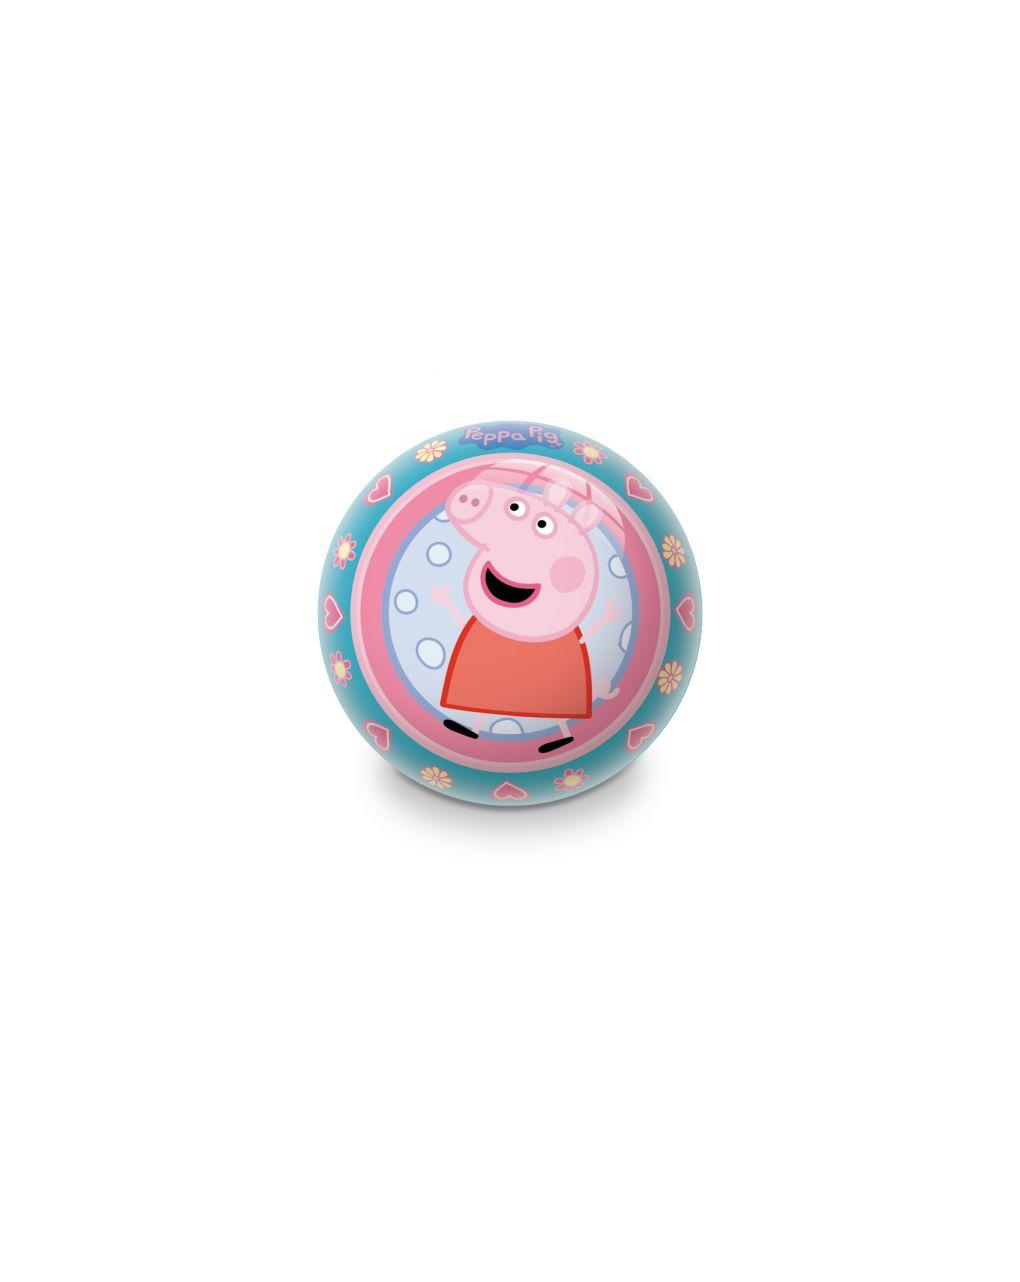 Mondo - pallone peppa pig d. 140 cm - Mondo